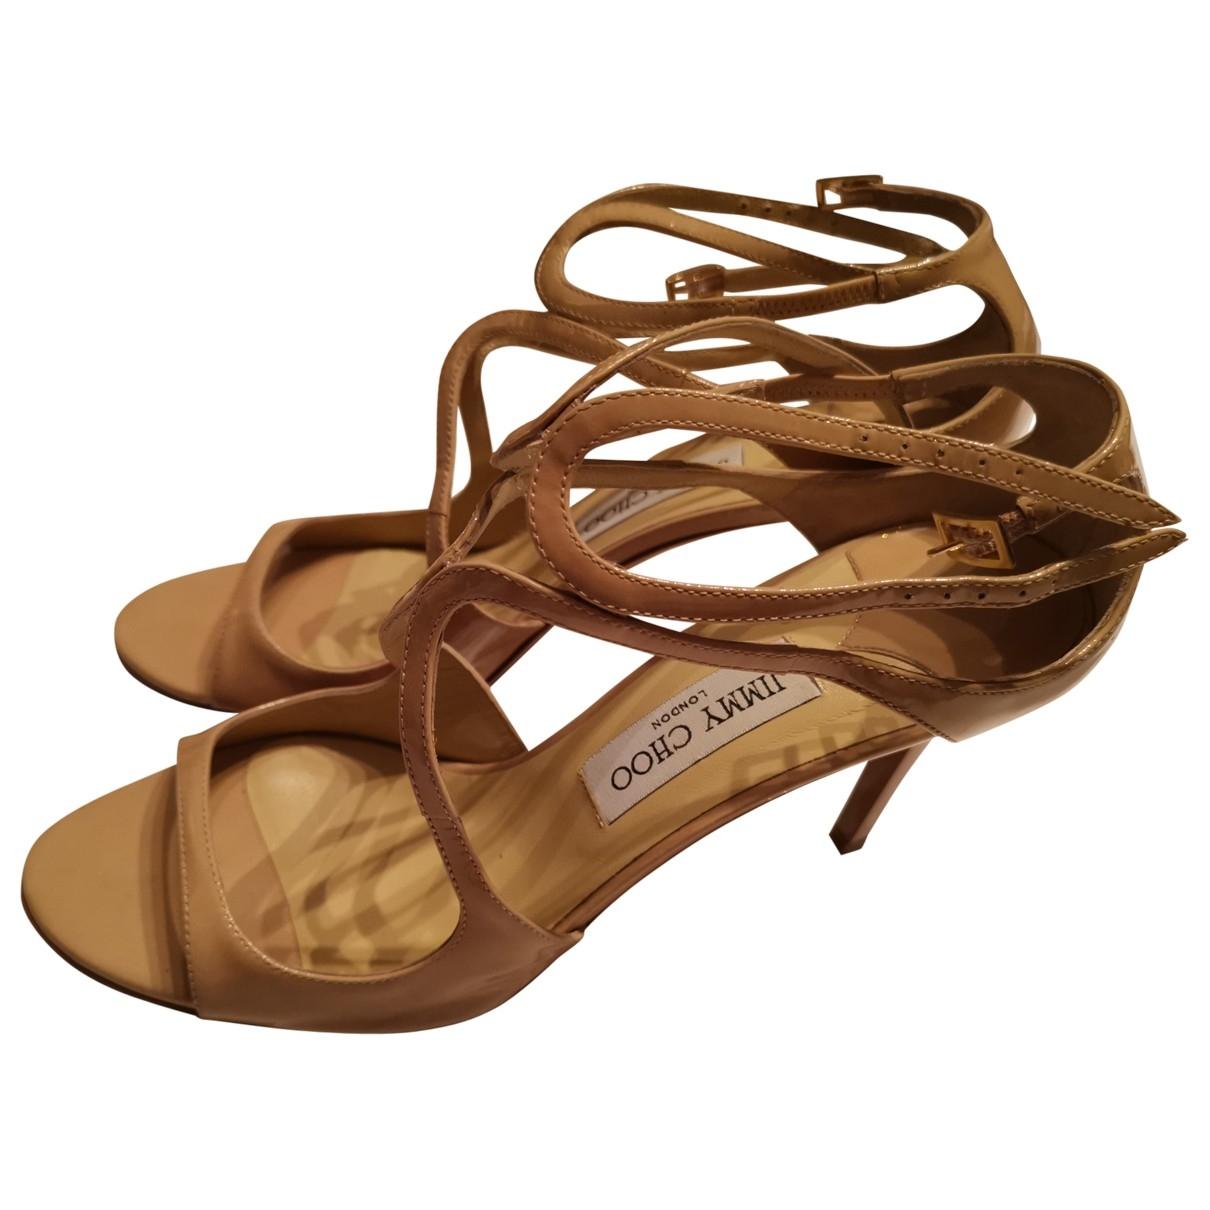 Jimmy Choo \N Beige Patent leather Sandals for Women 40.5 EU